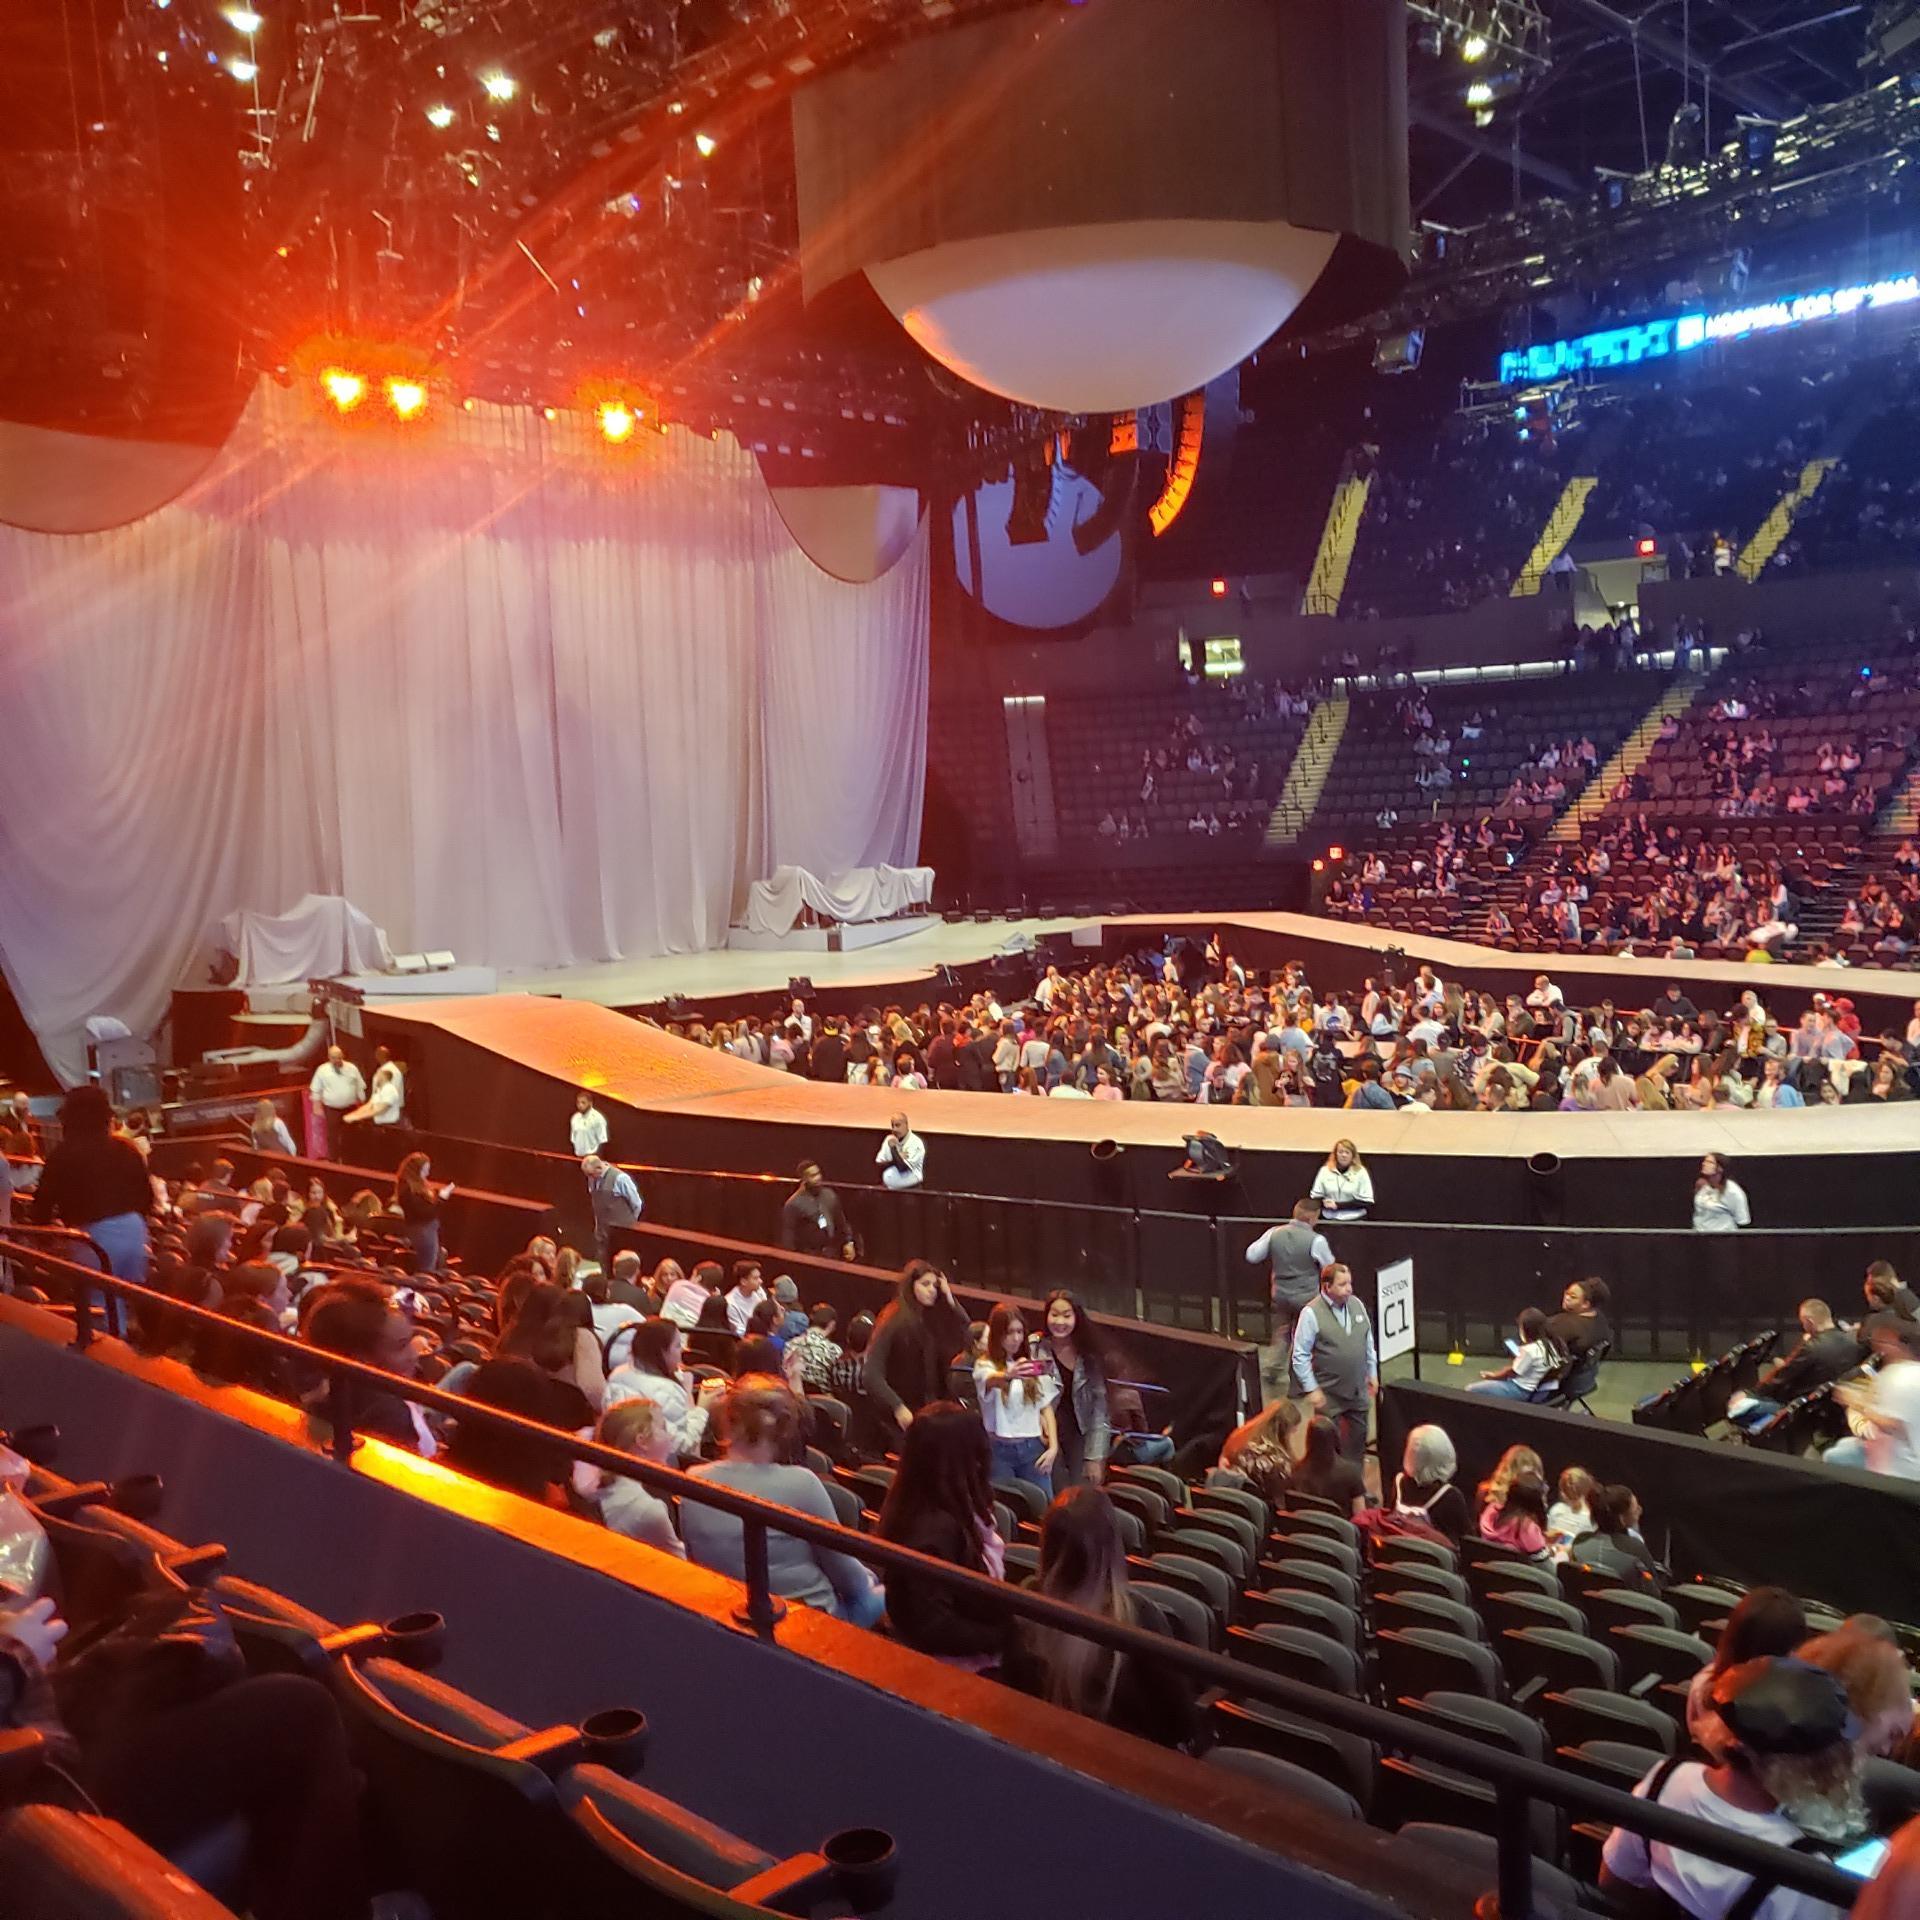 Nassau Veterans Memorial Coliseum Section 117 Row 3 Seat 1